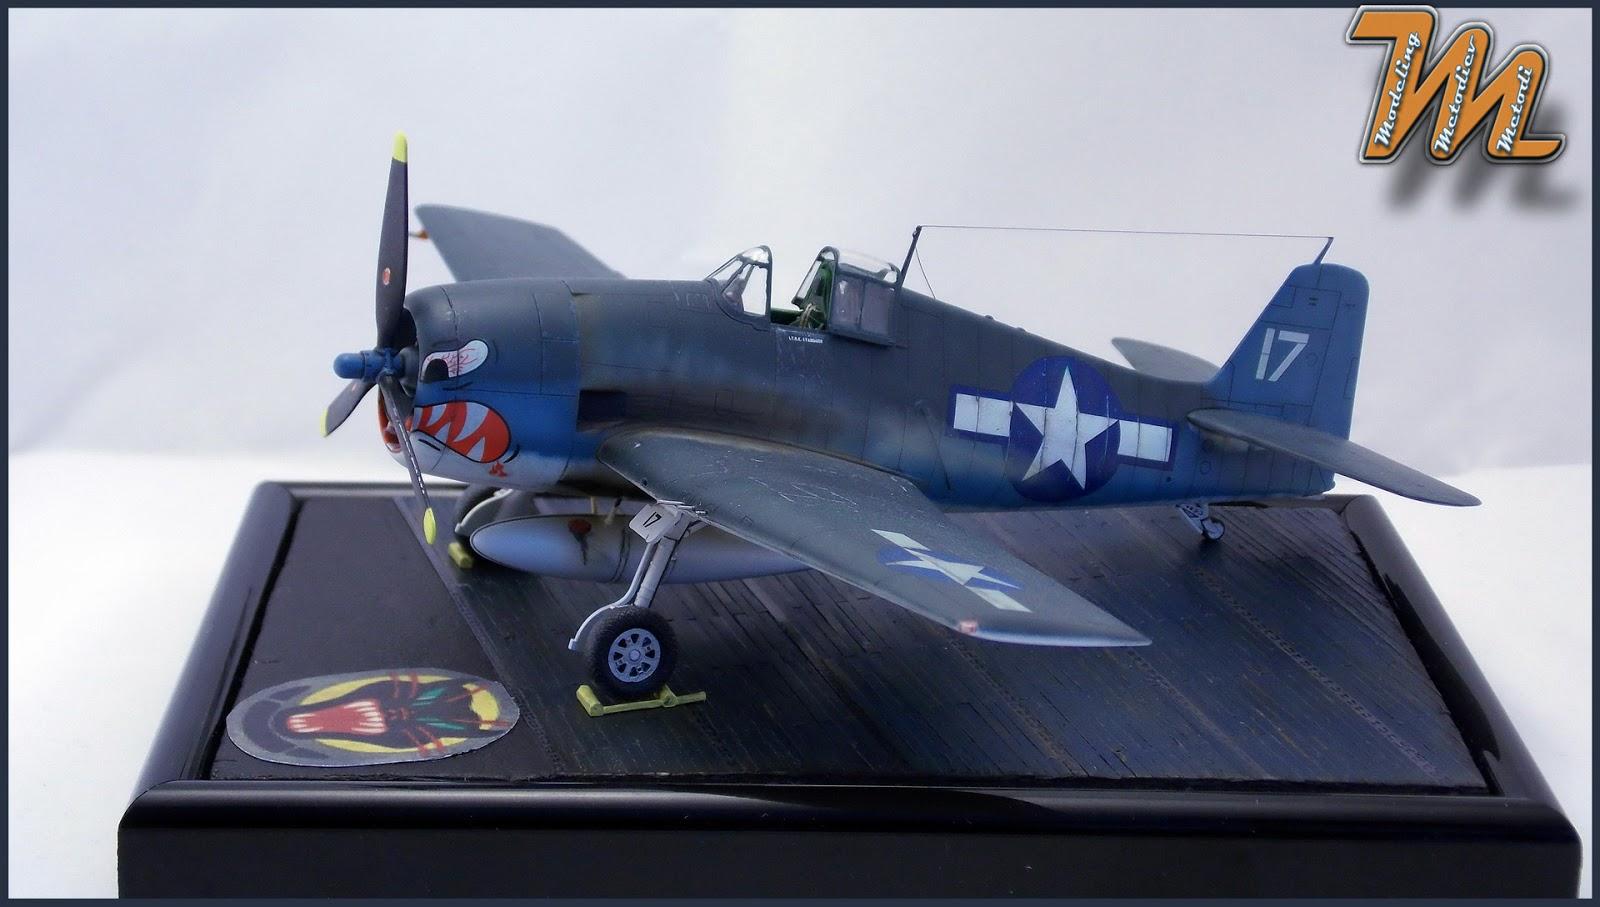 F6F-3, Hellcat, VF27, scale model